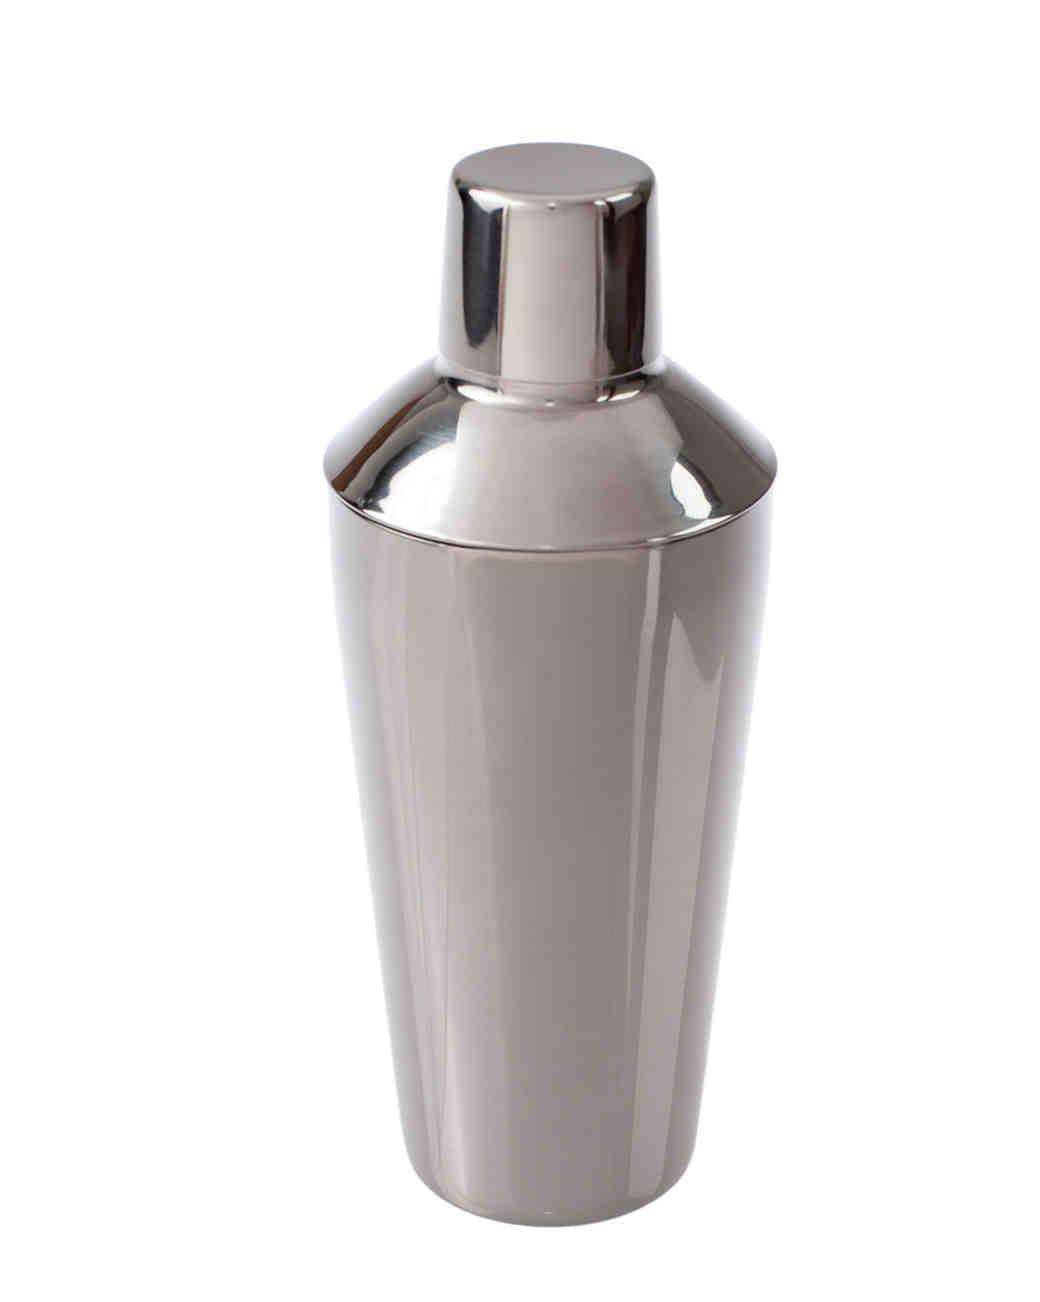 anniversary-gifts-steel-izola-cocktail-shaker-0115.jpg